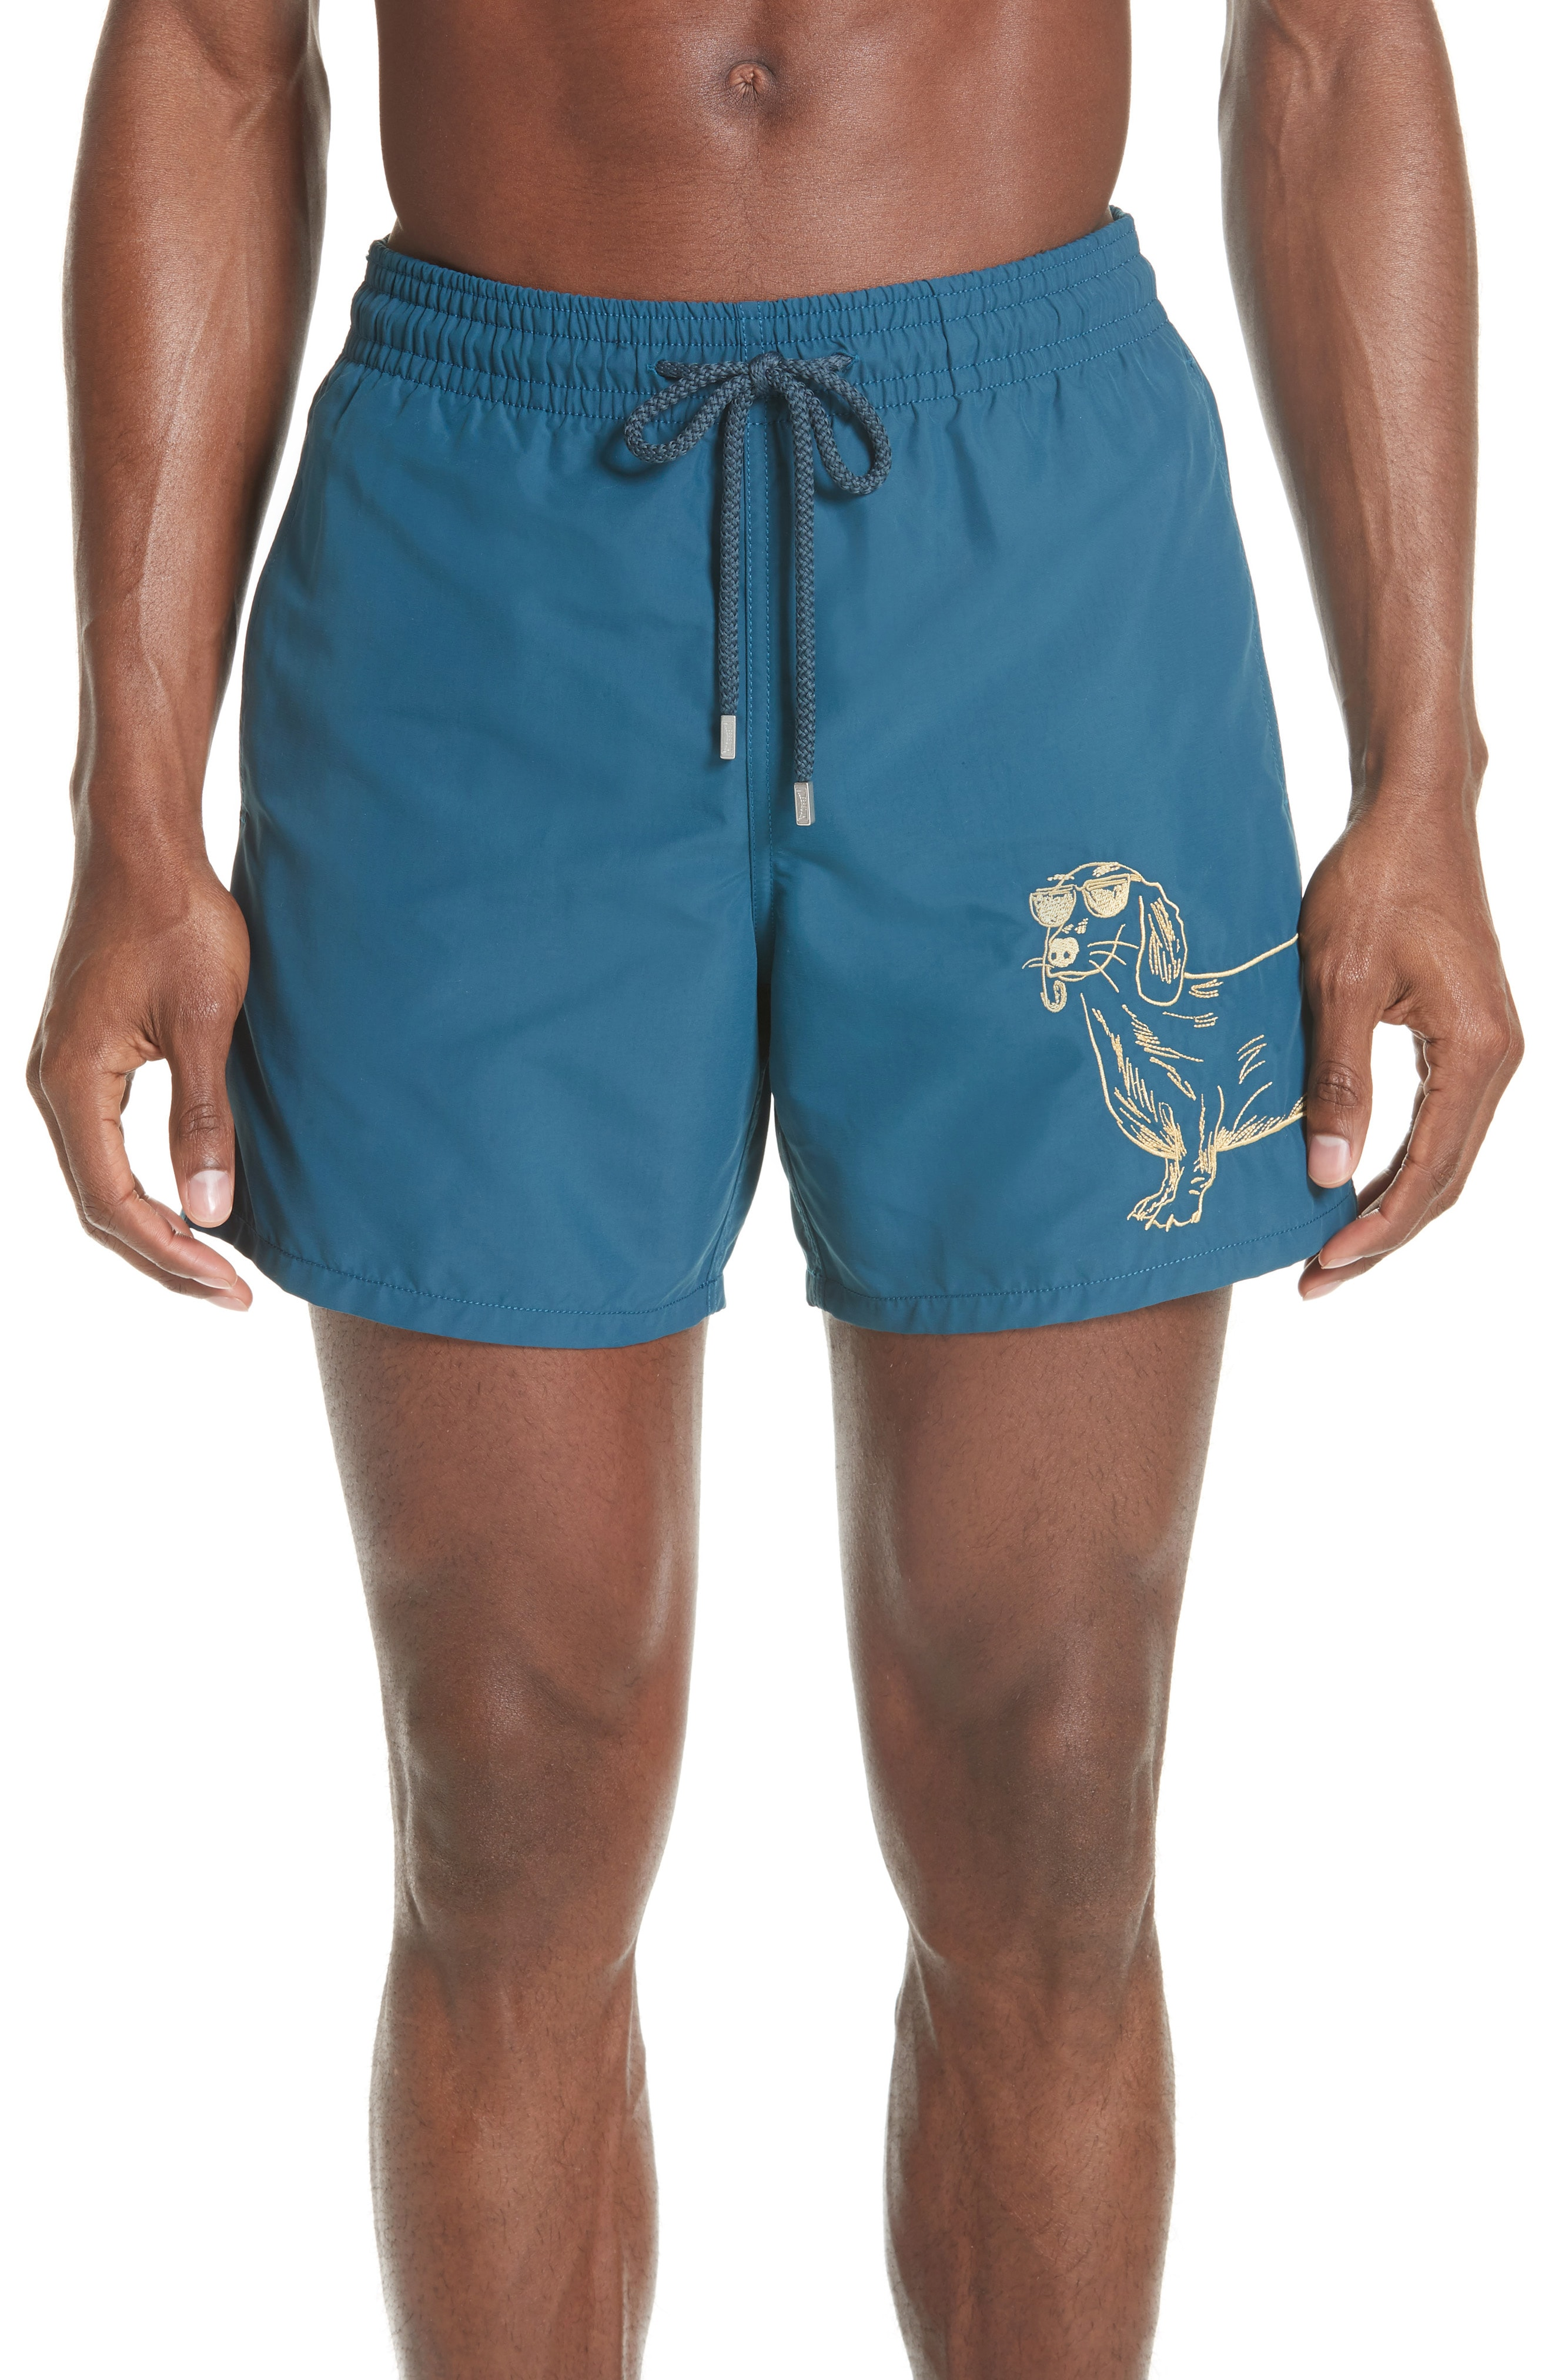 Vilebrequin Embroidered Sunny Dog Swim Trunks